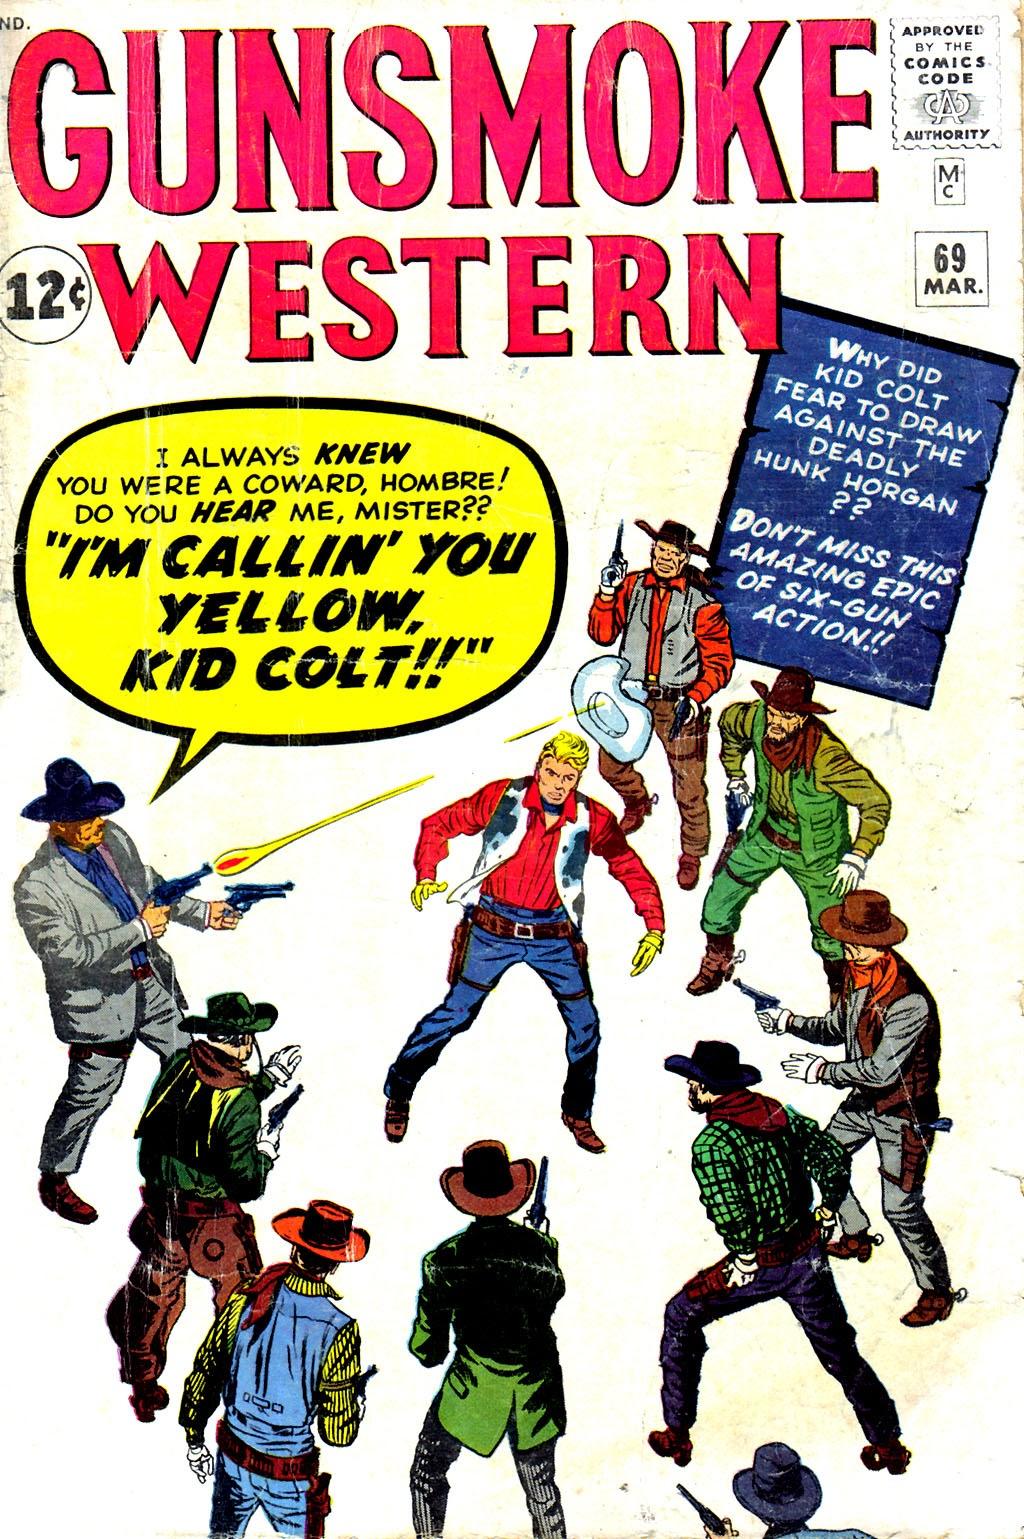 Gunsmoke Western issue 69 - Page 1